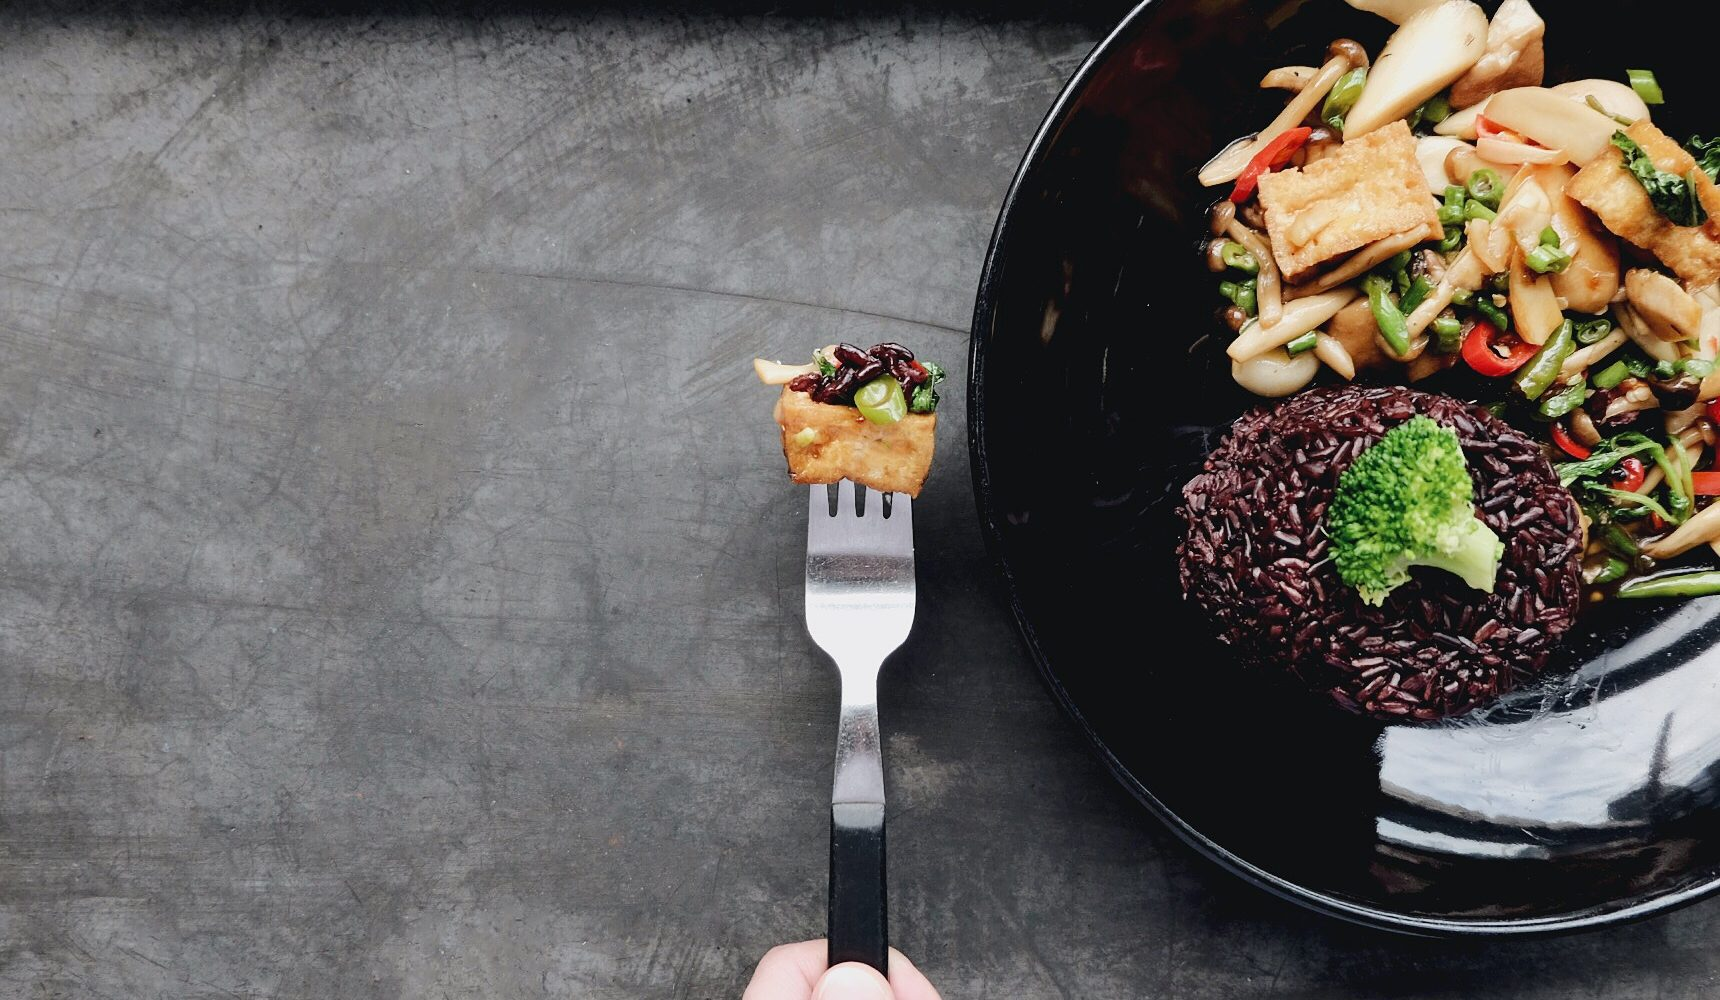 broccoli-revolution-food-on-fork